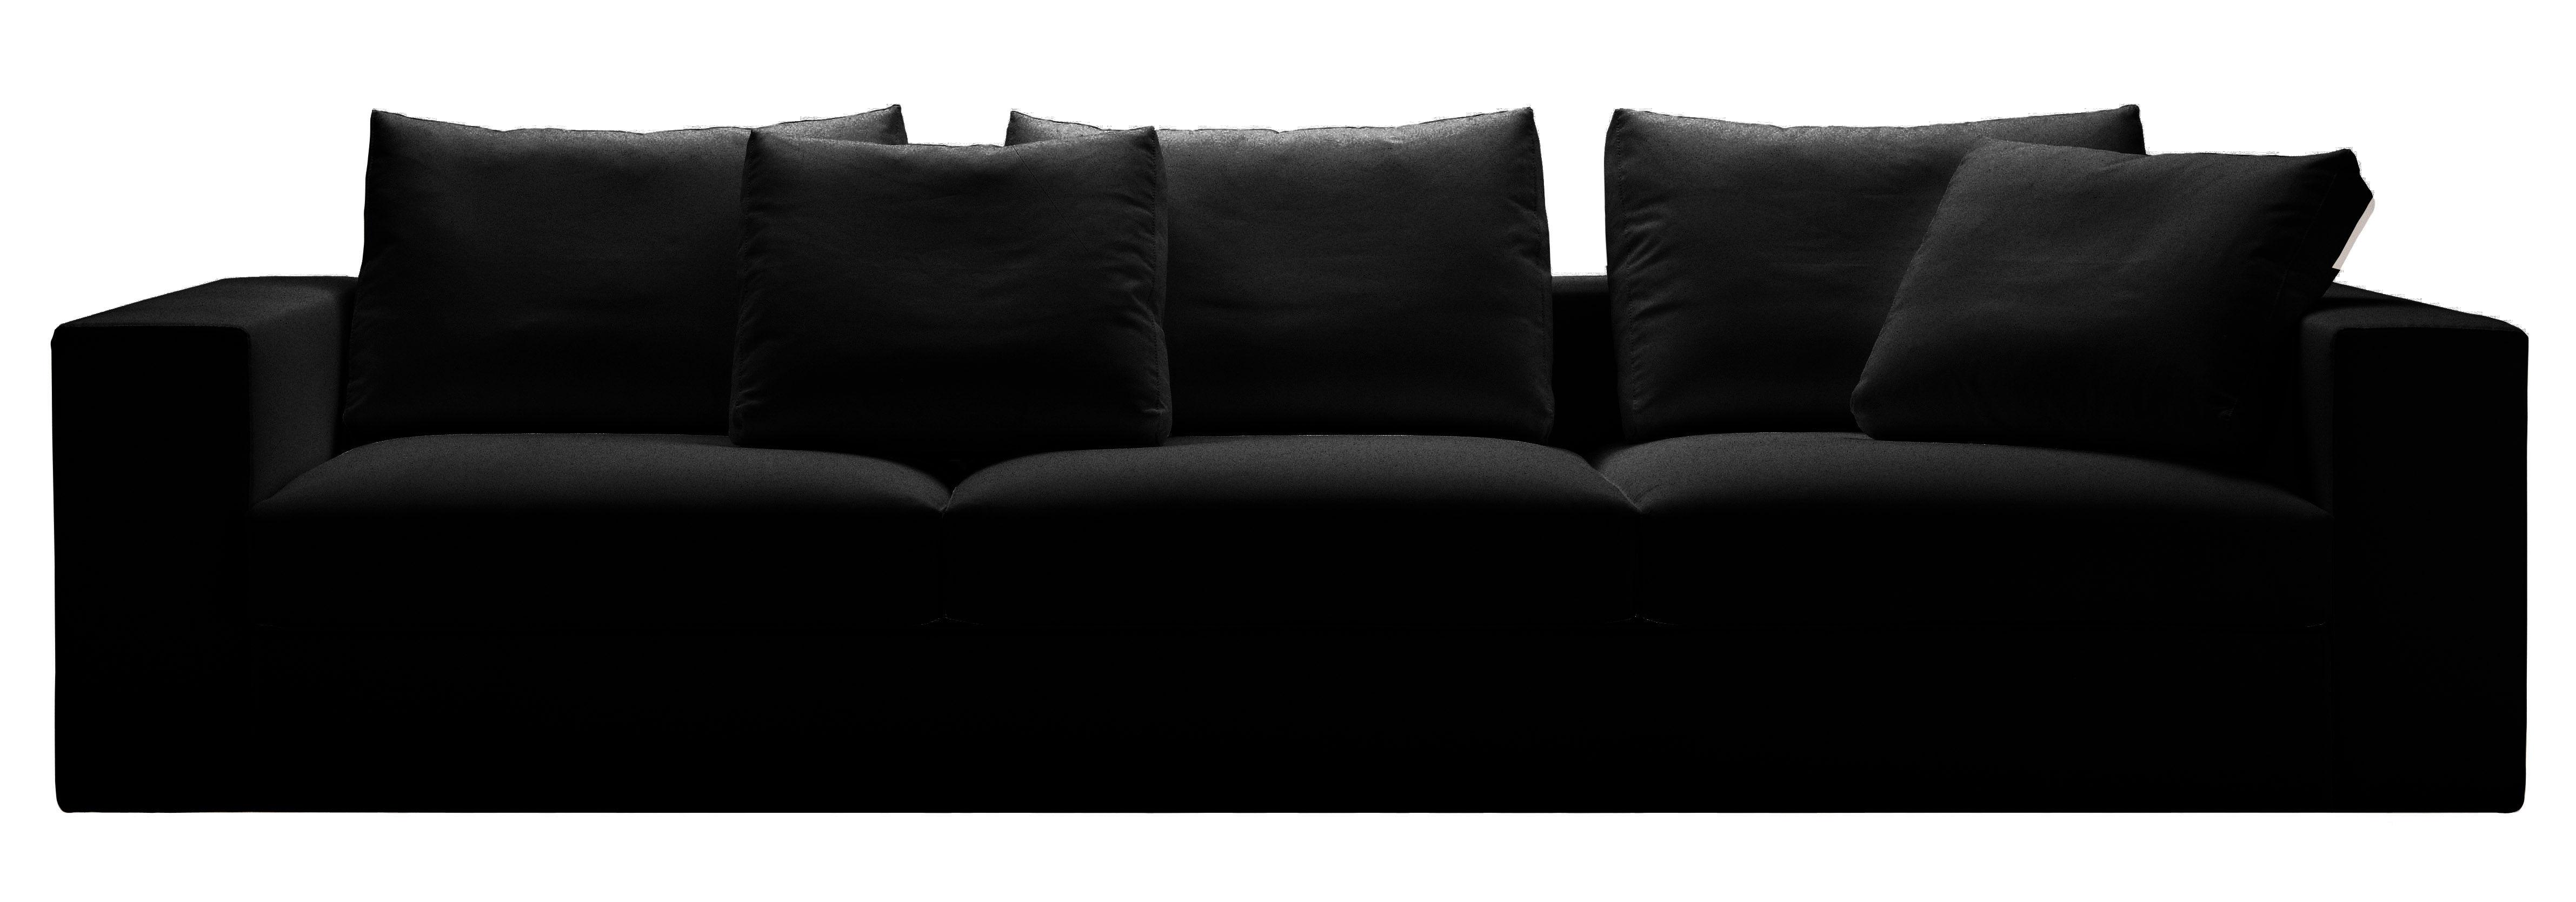 Canap droit beta cuir 3 places l 284 cm cuir noir zanotta - Canape grande profondeur ...